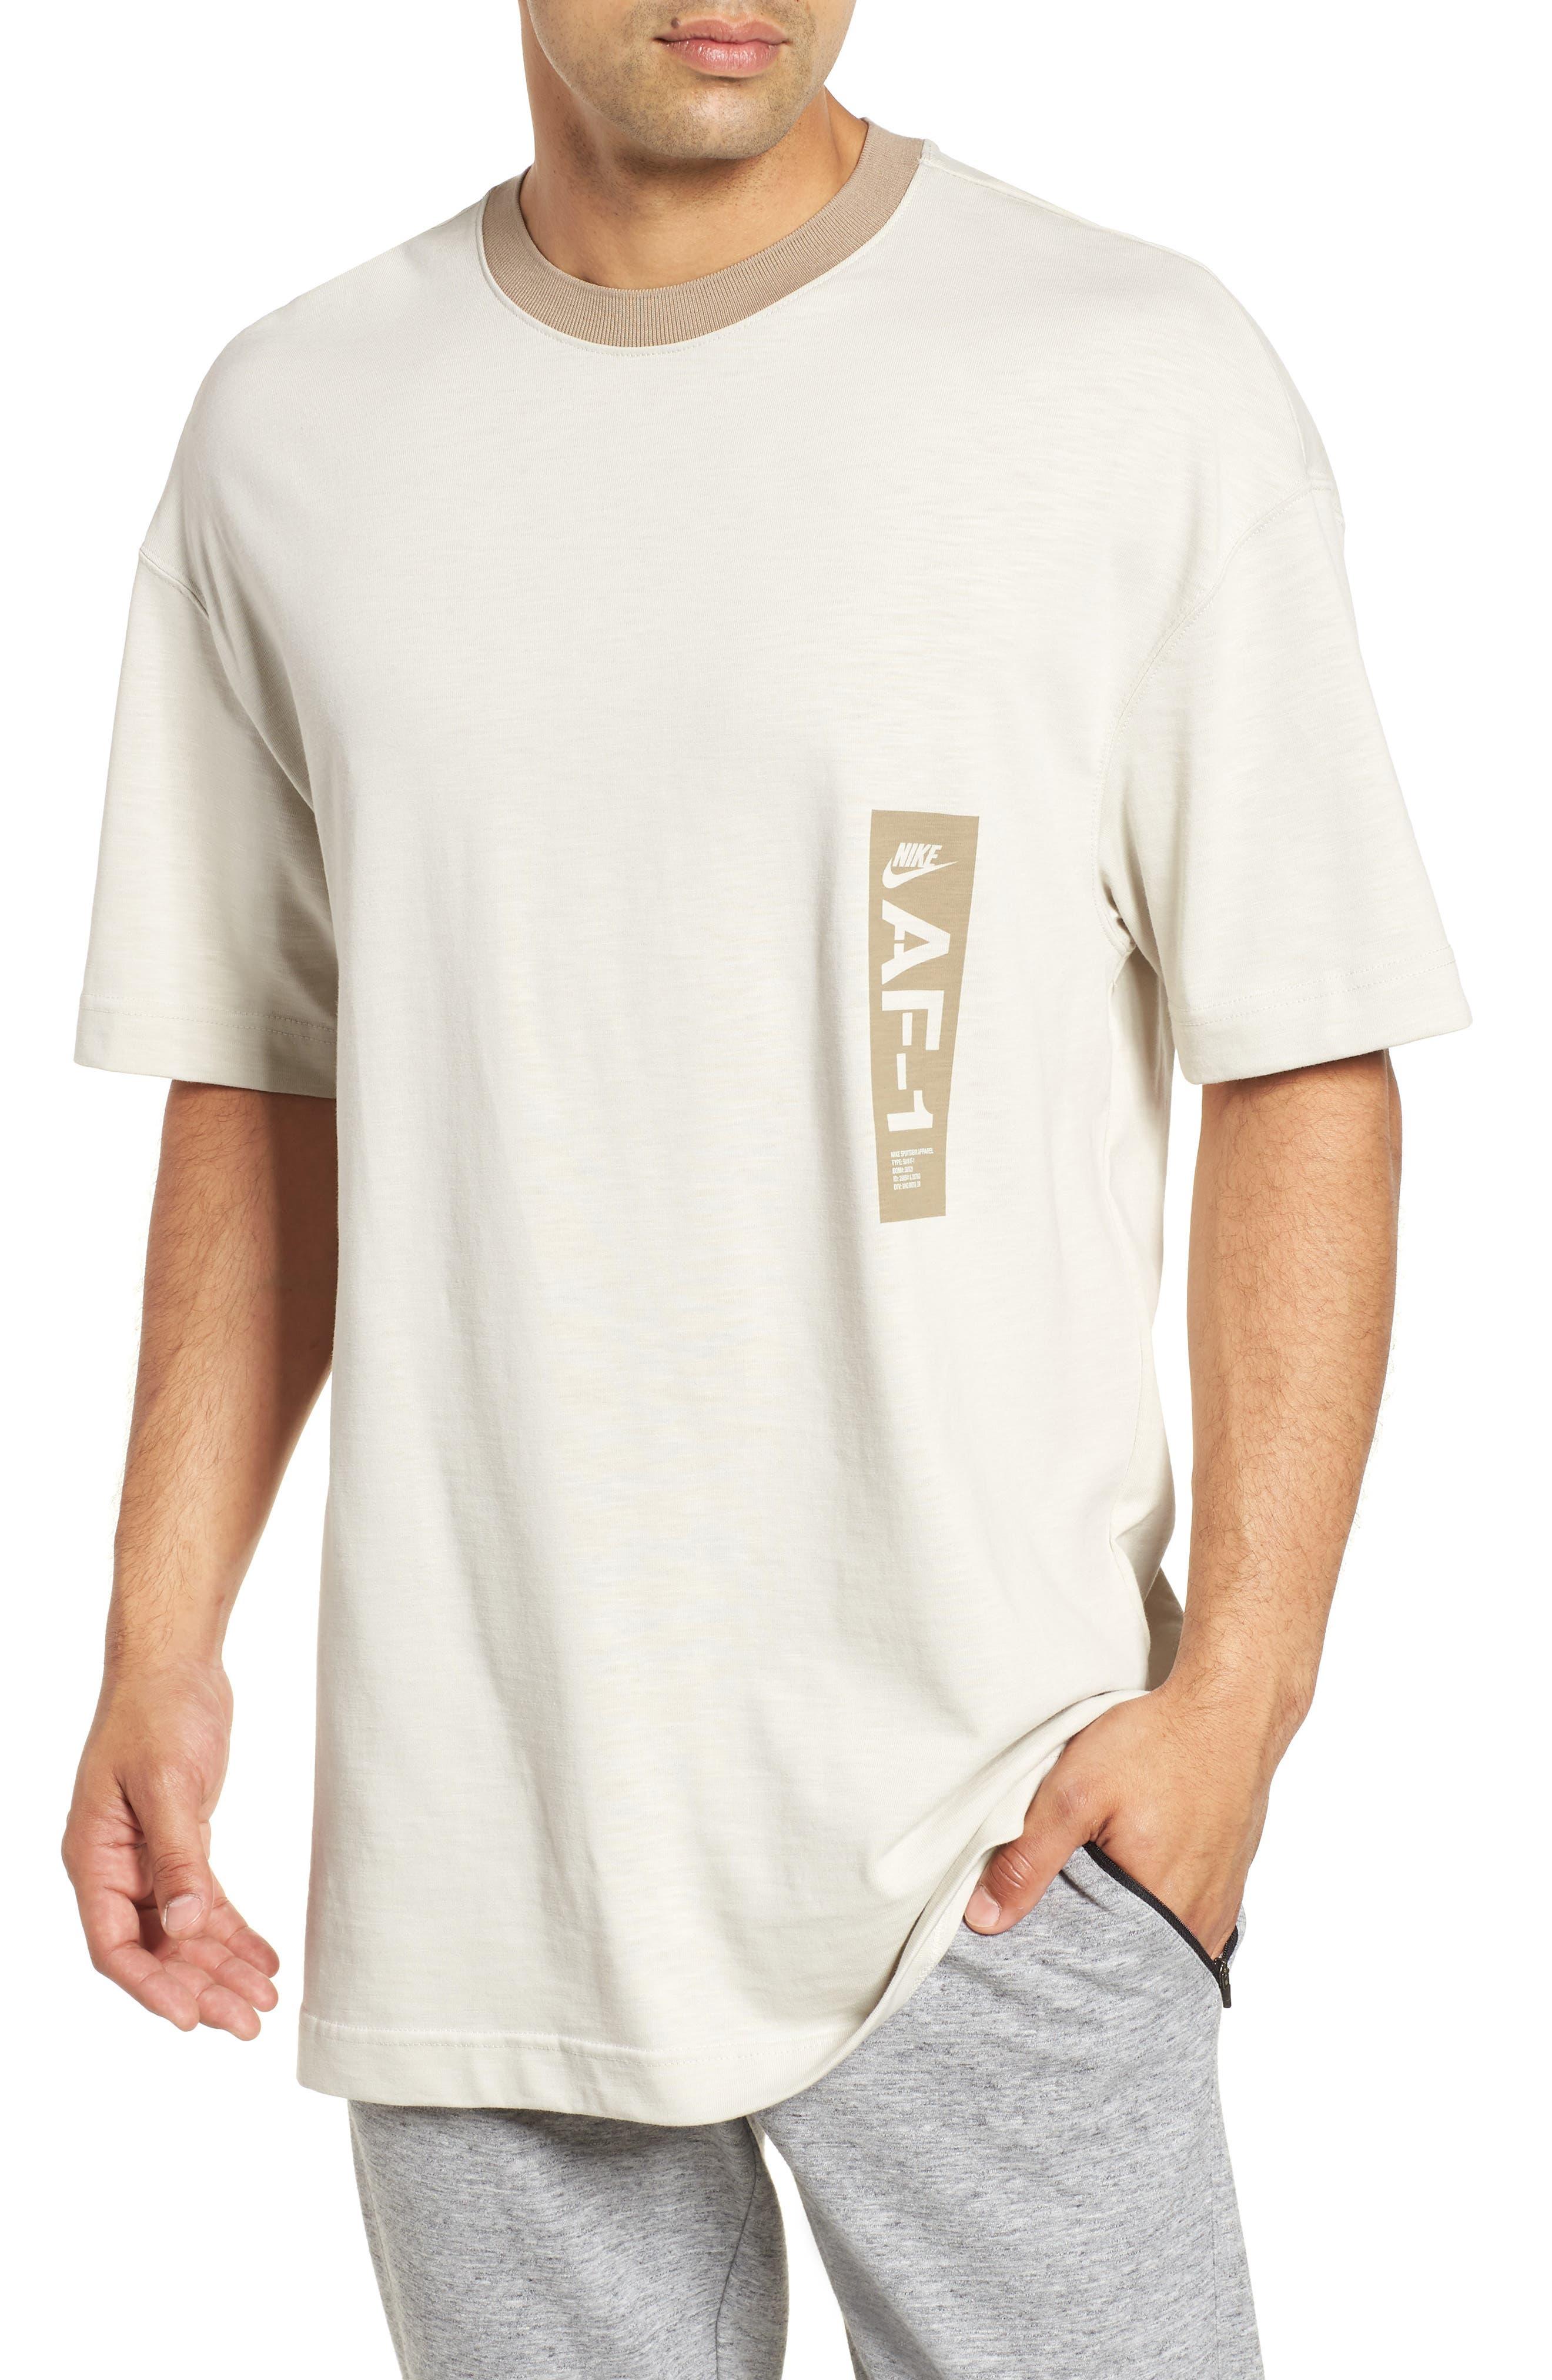 Sportswear AF1 Graphic T-Shirt,                             Main thumbnail 1, color,                             LIGHT BONE/ KHAKI